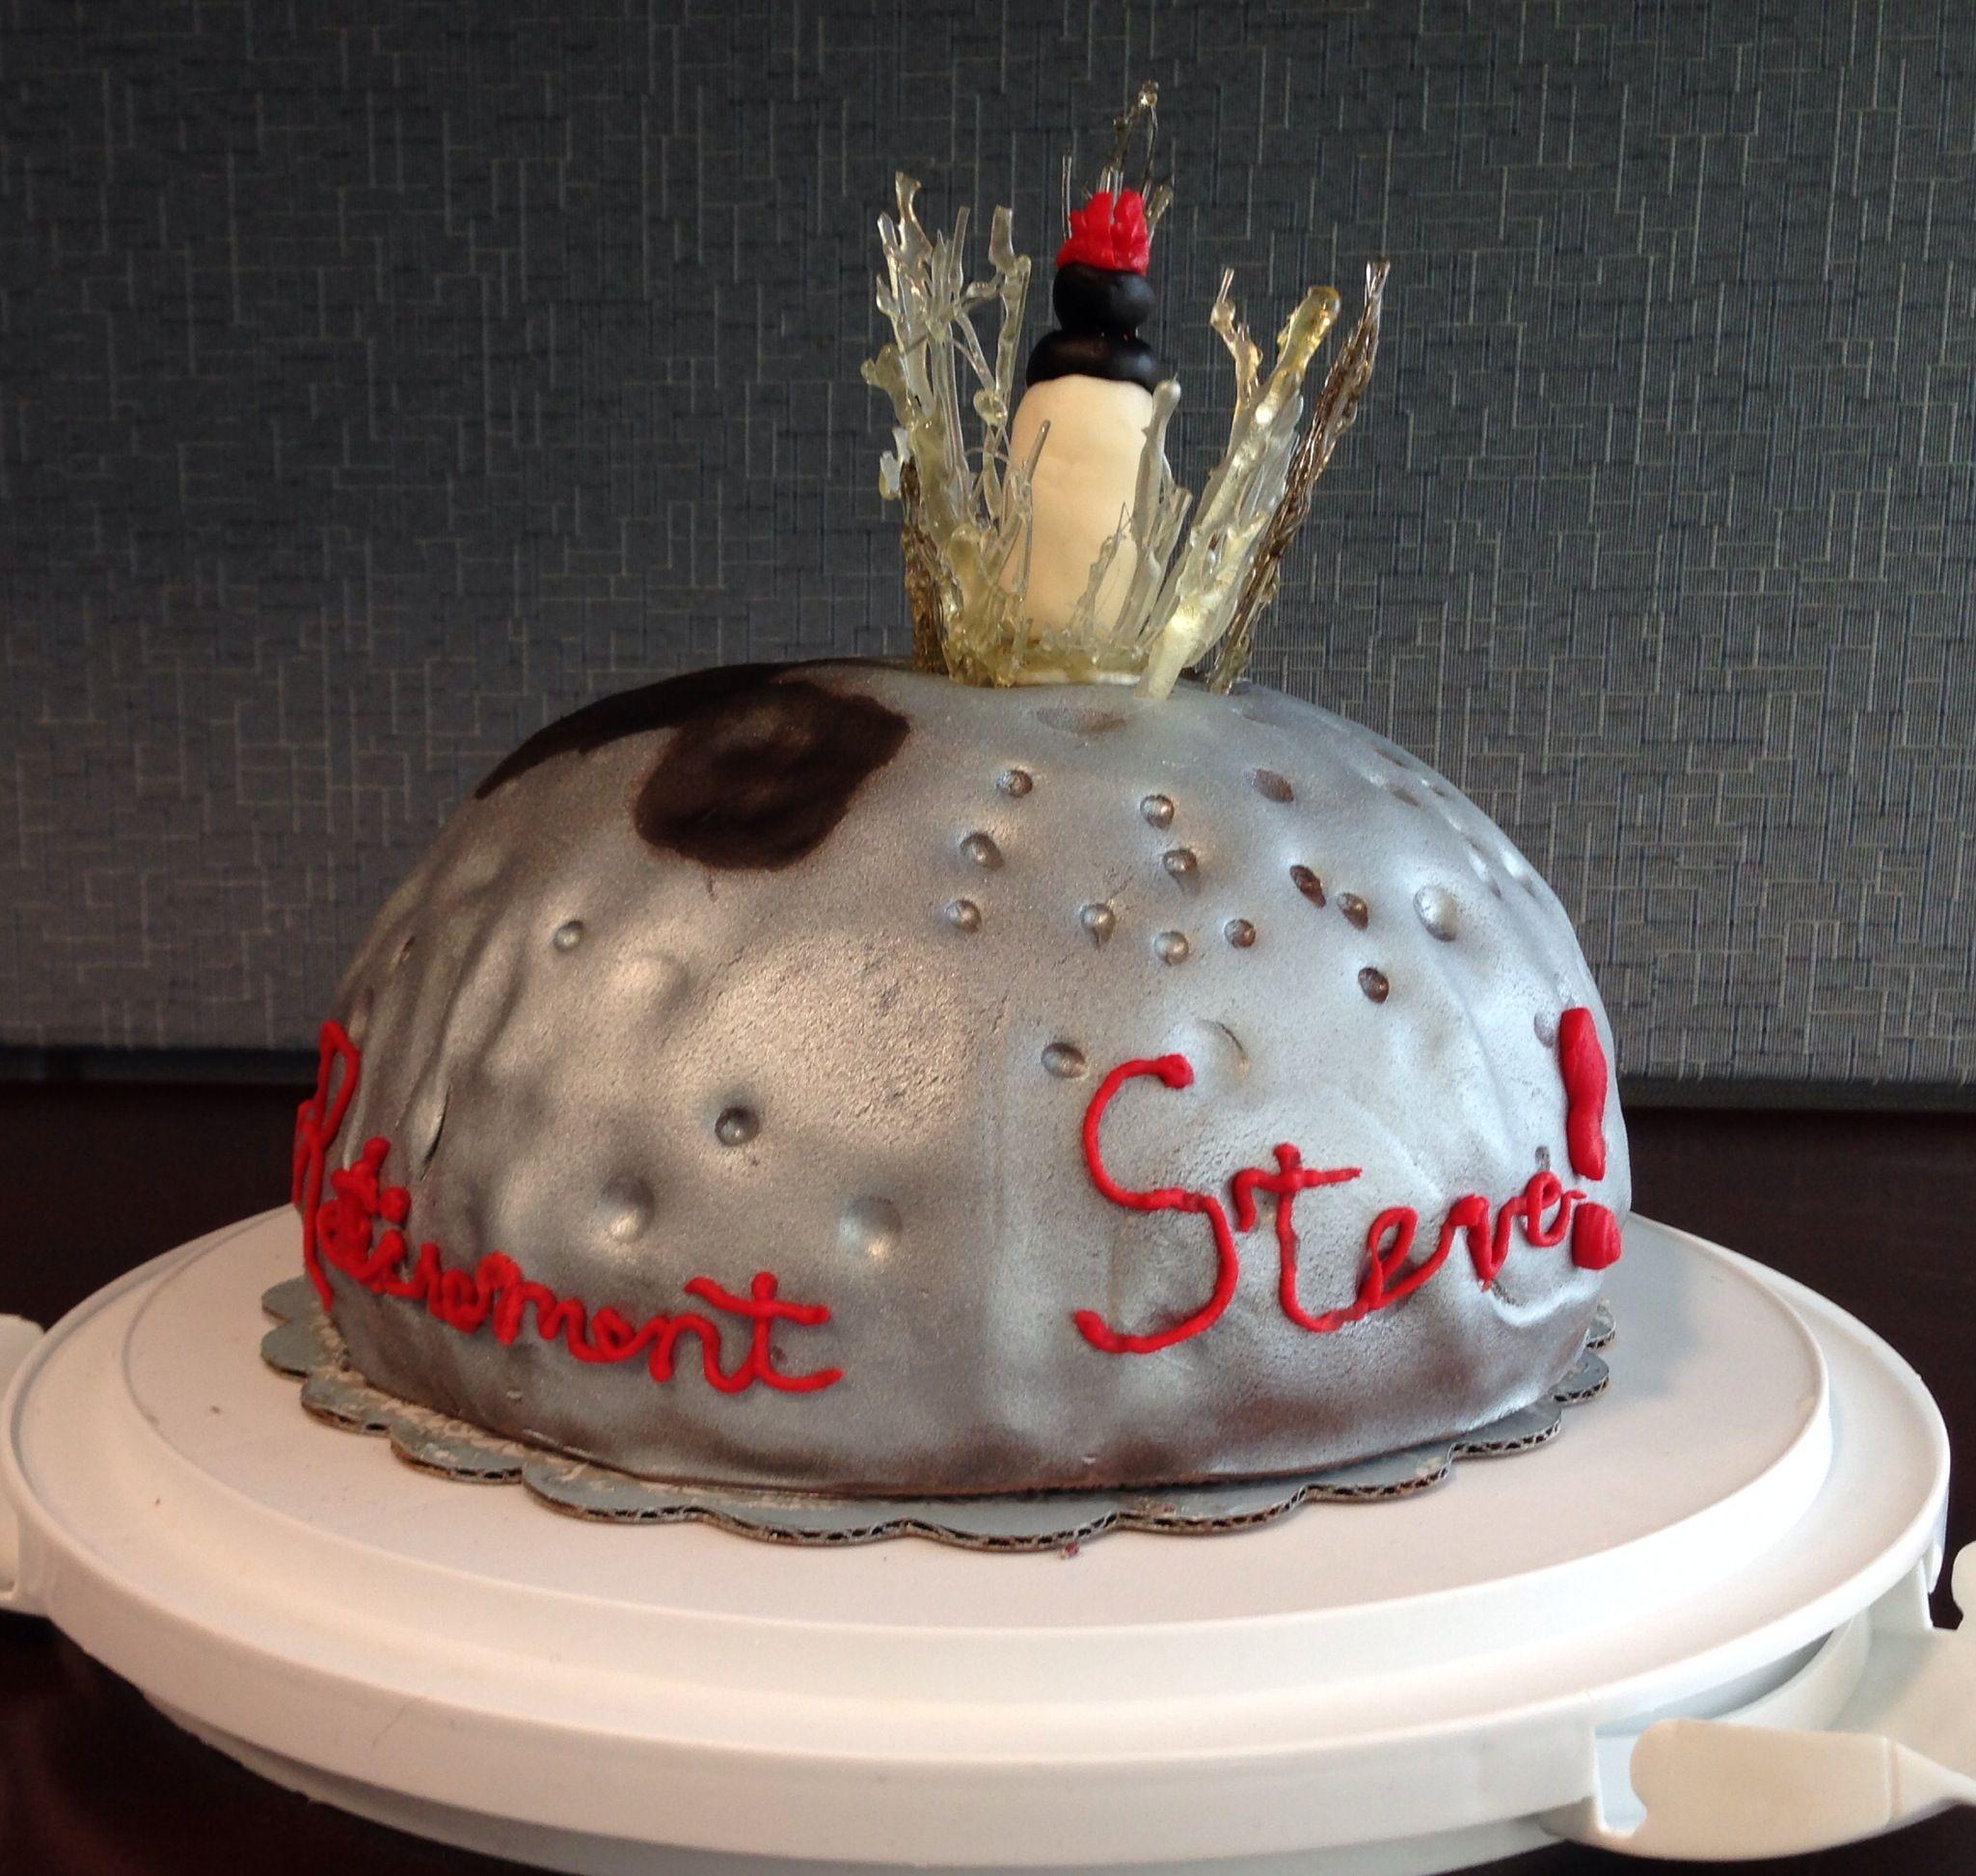 Cake depicting LRO impacting the moon to celebrate a NASA